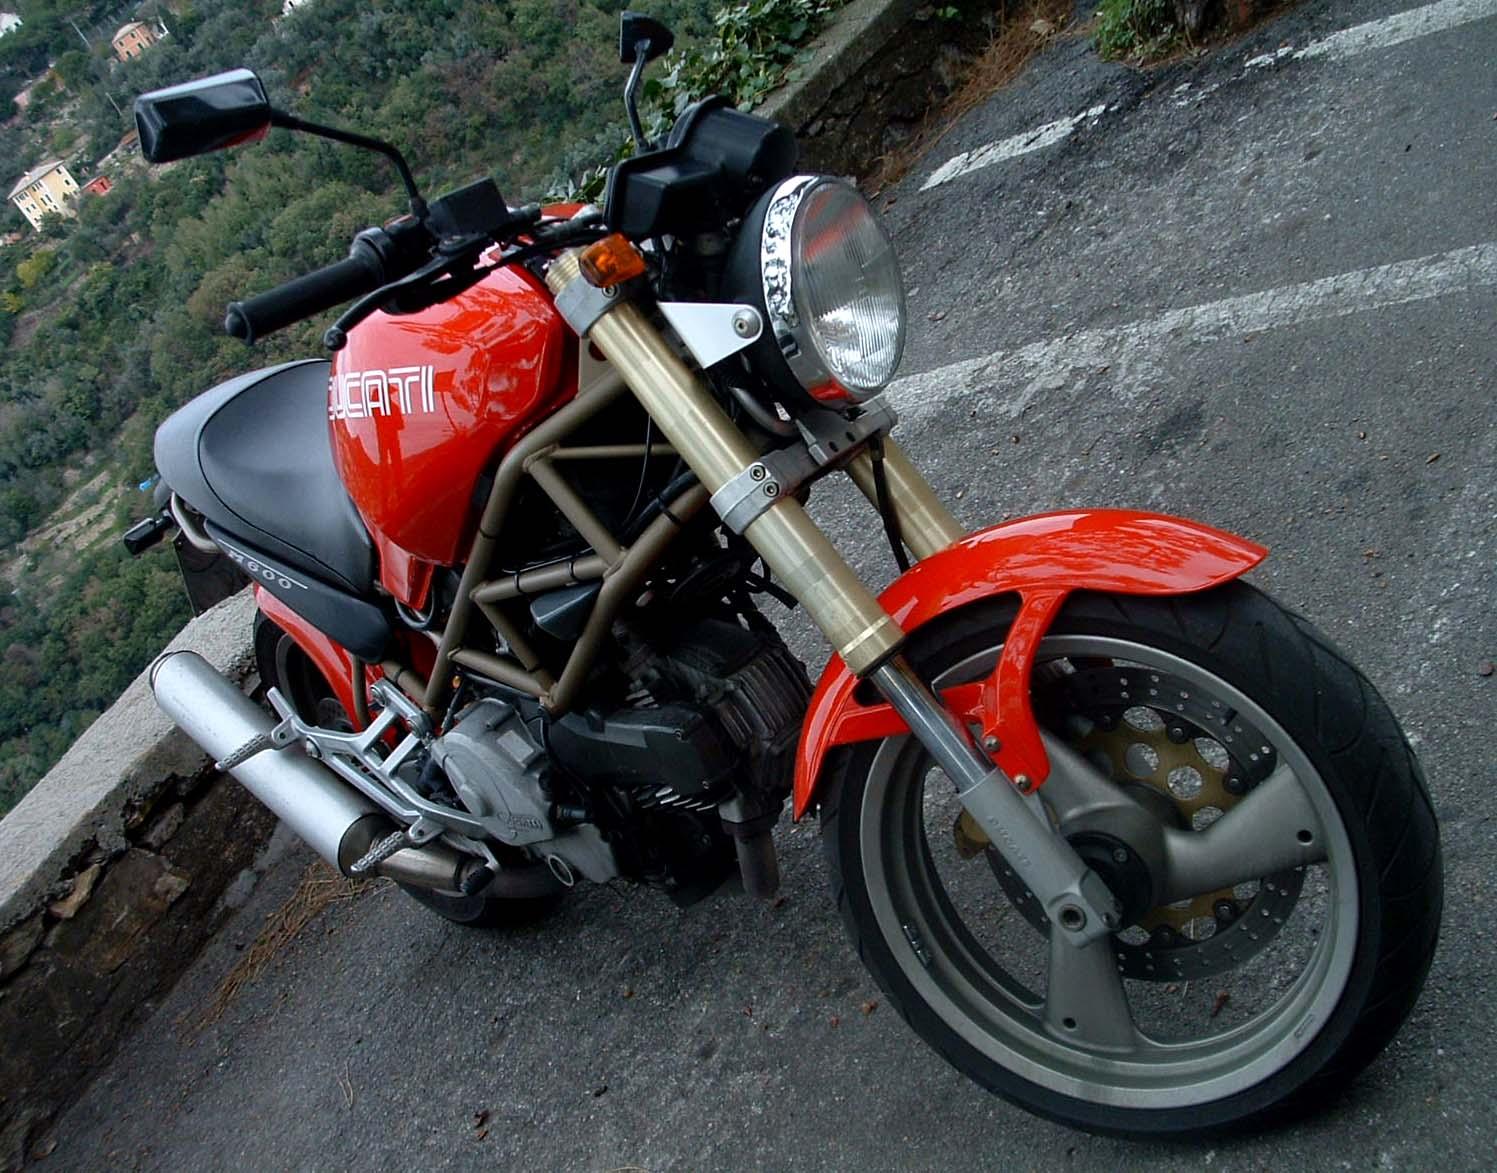 File:Ducati ... Ducati Bikes Wiki